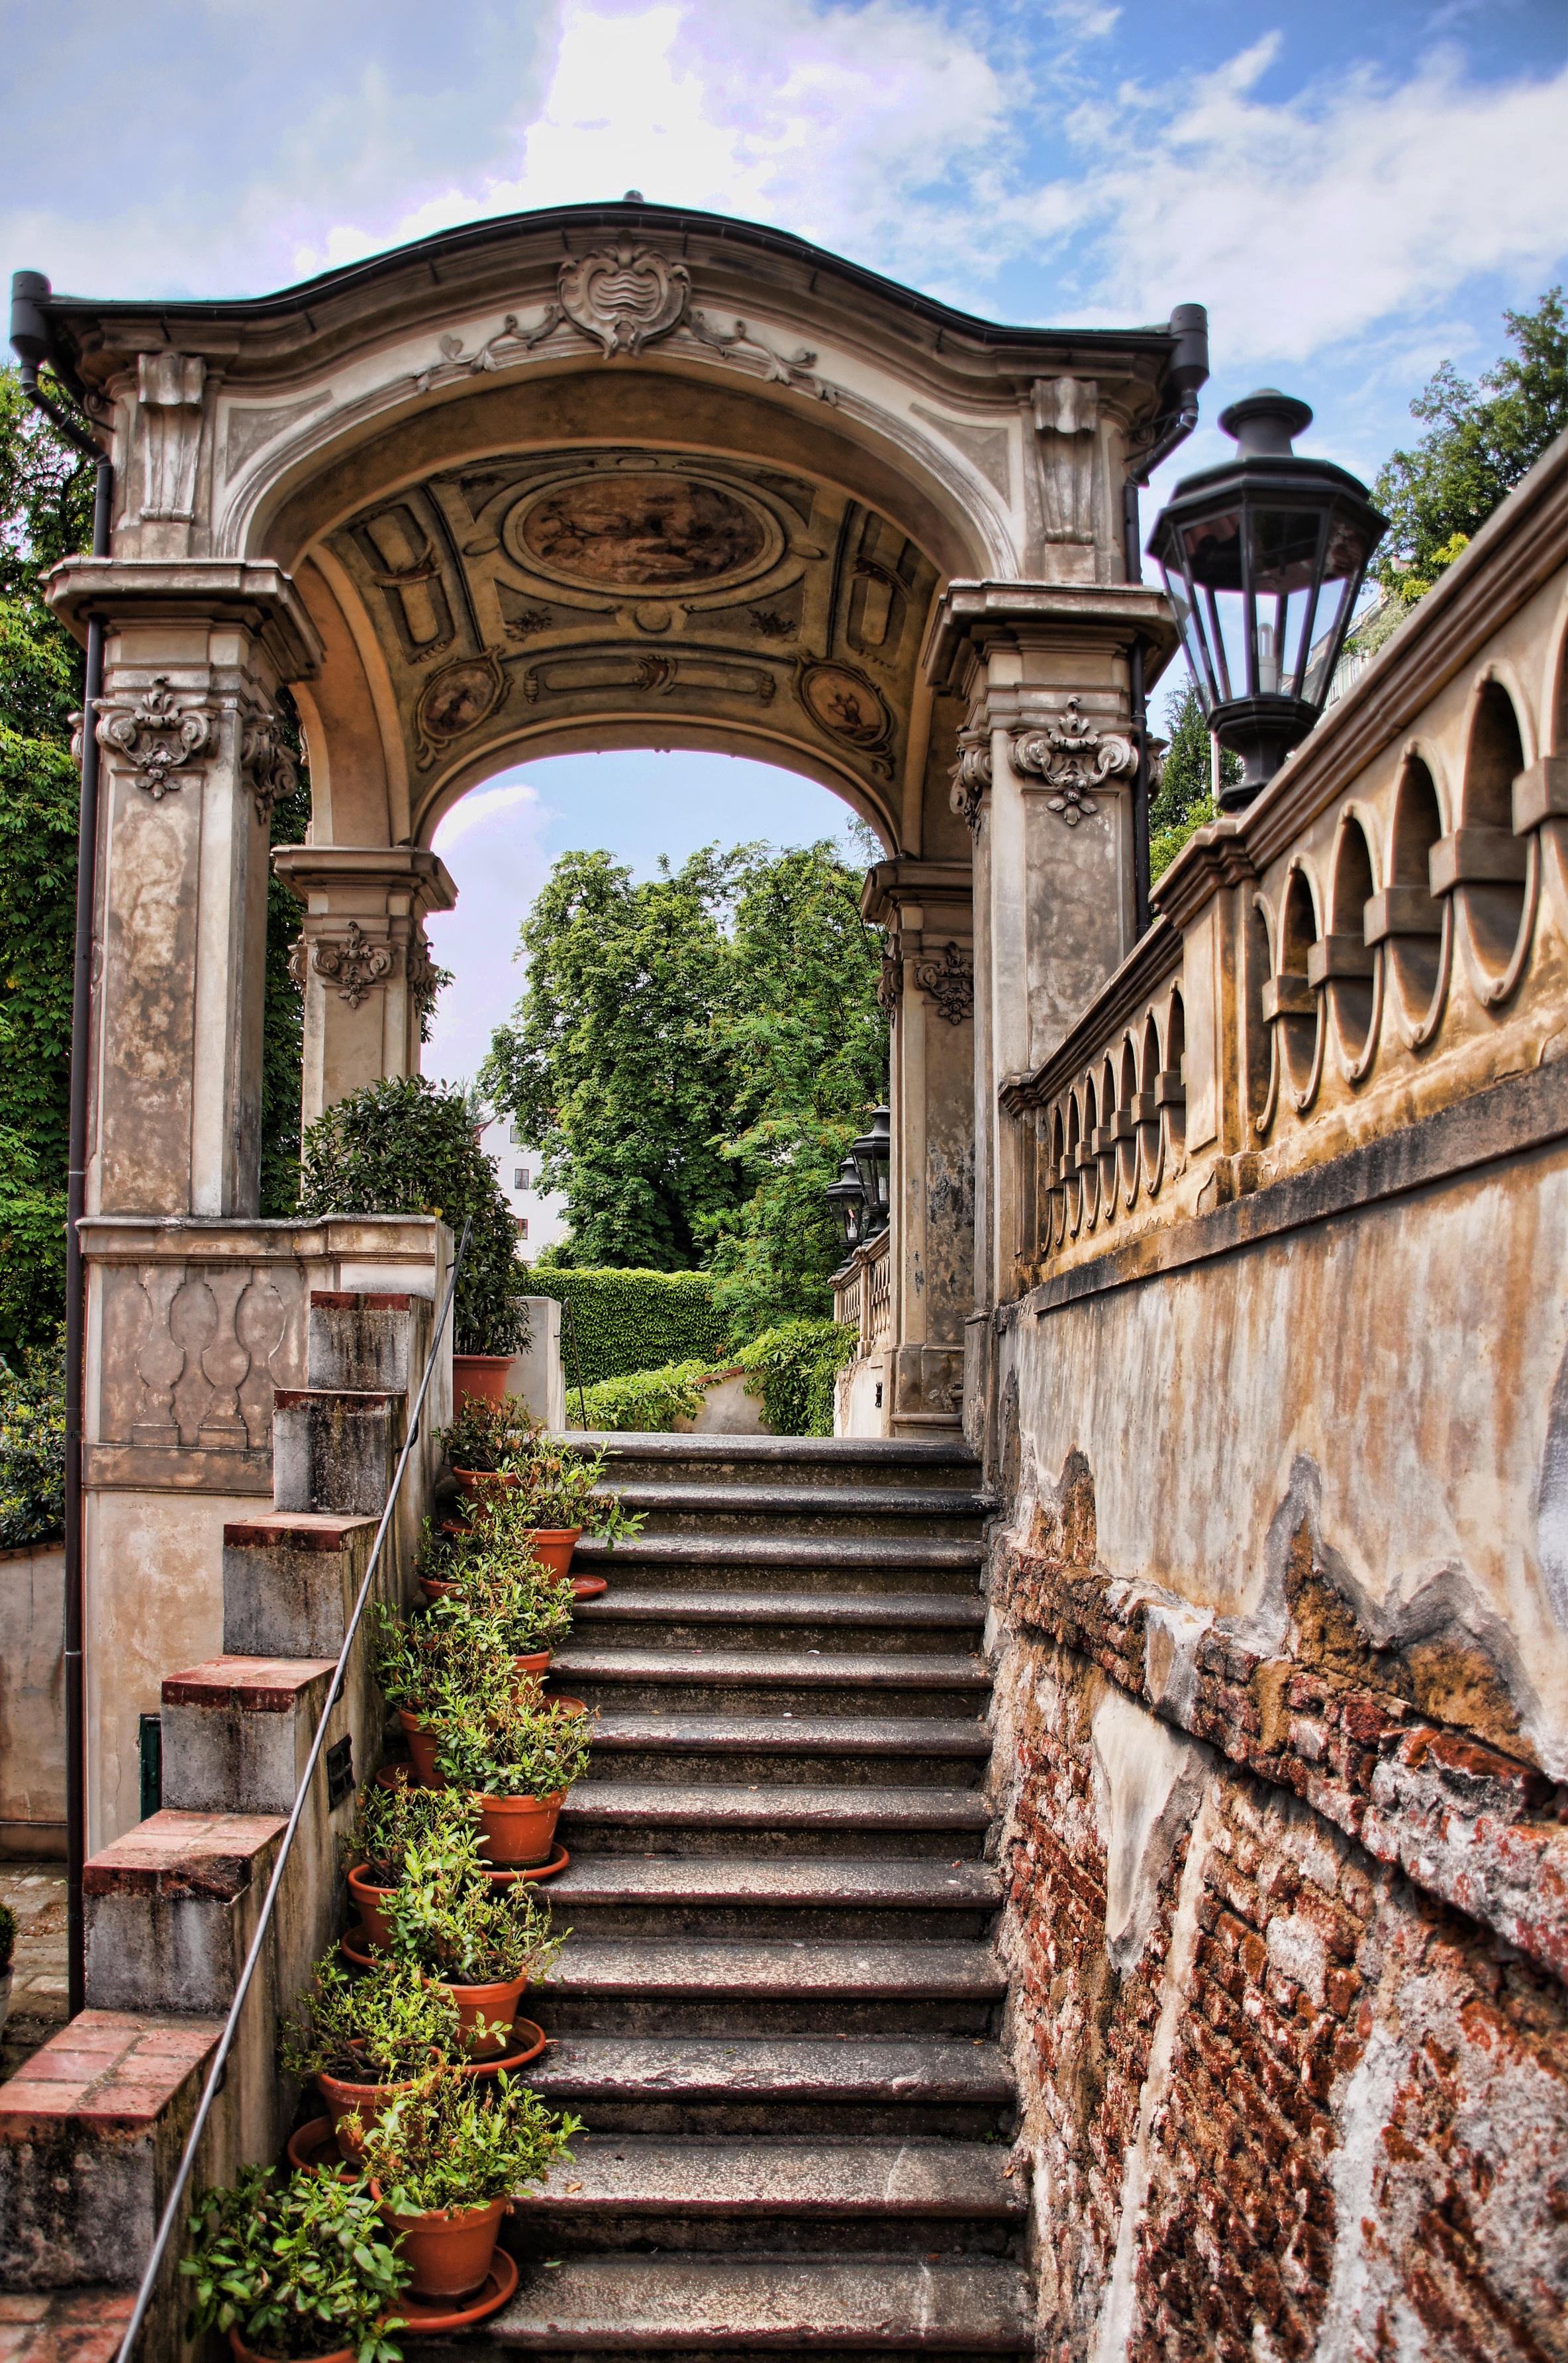 Fotos gratis arquitectura palacio pared viajar arco for Arco decorativo jardin